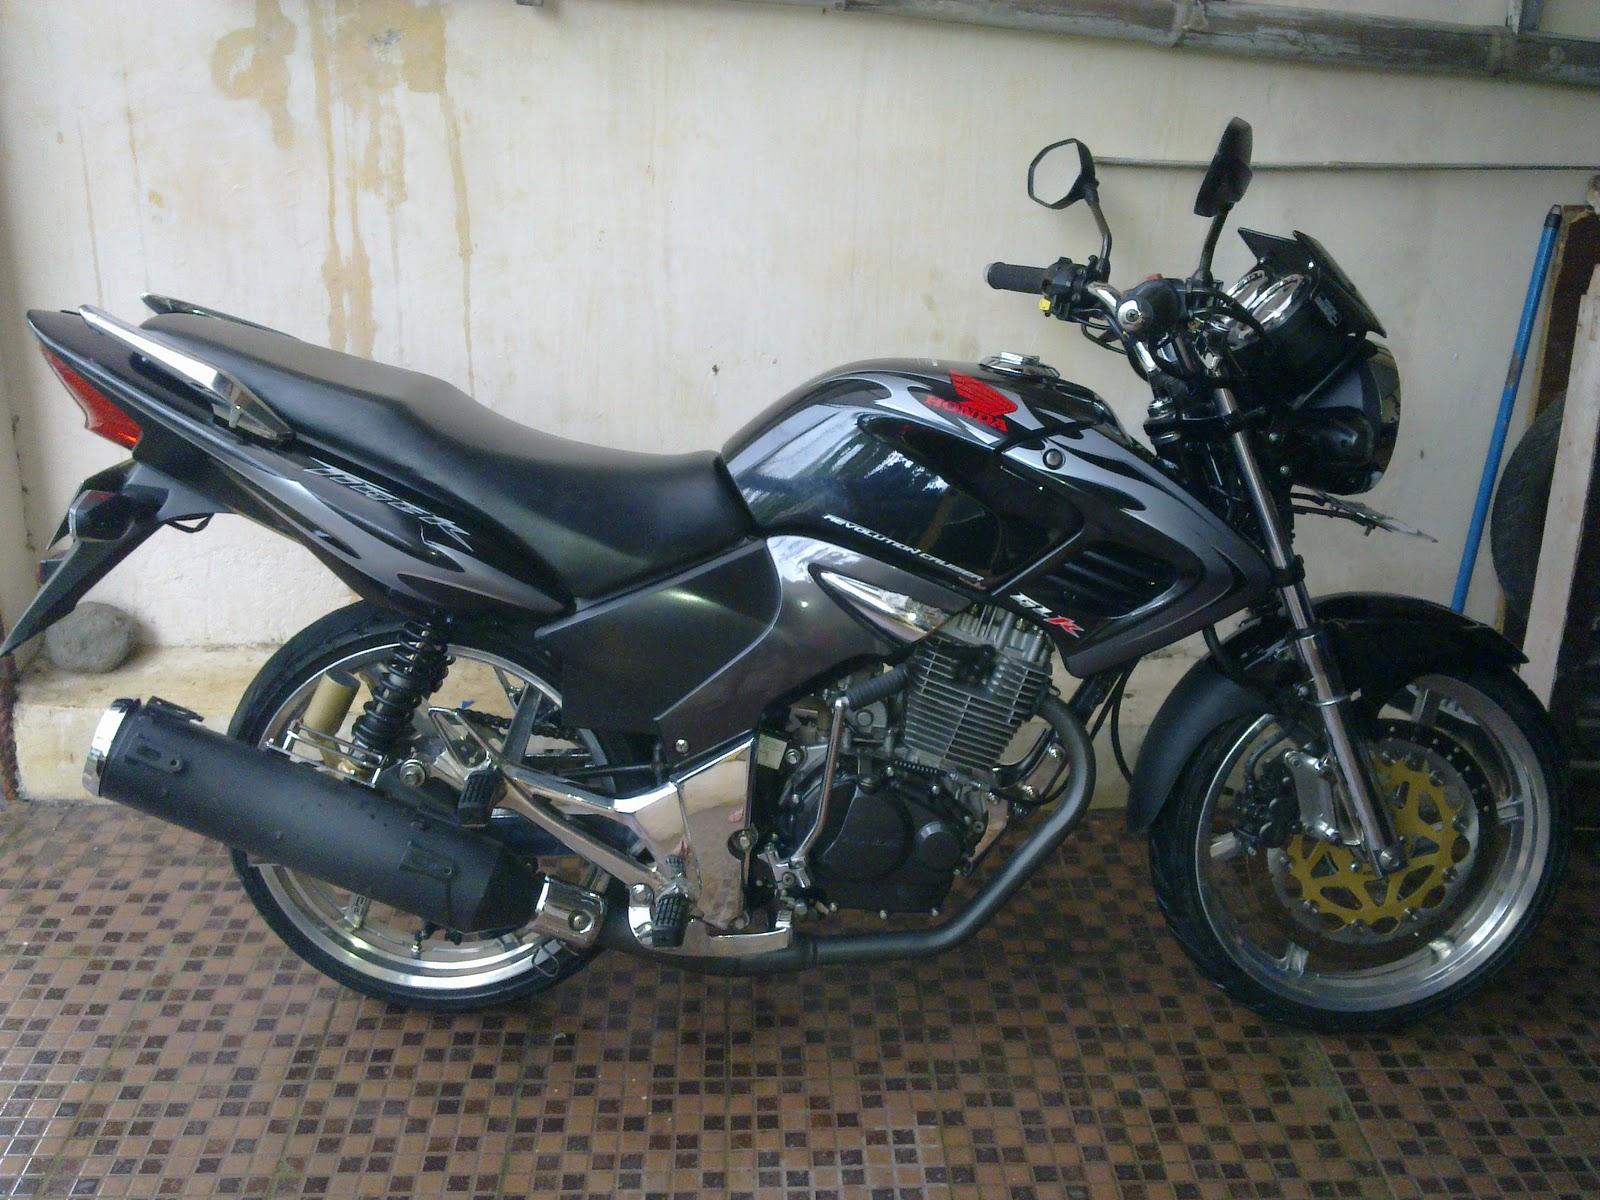 Kumpulan Foto Dan Gambar Modifikasi Motor Honda Tiger Revo Terbaru